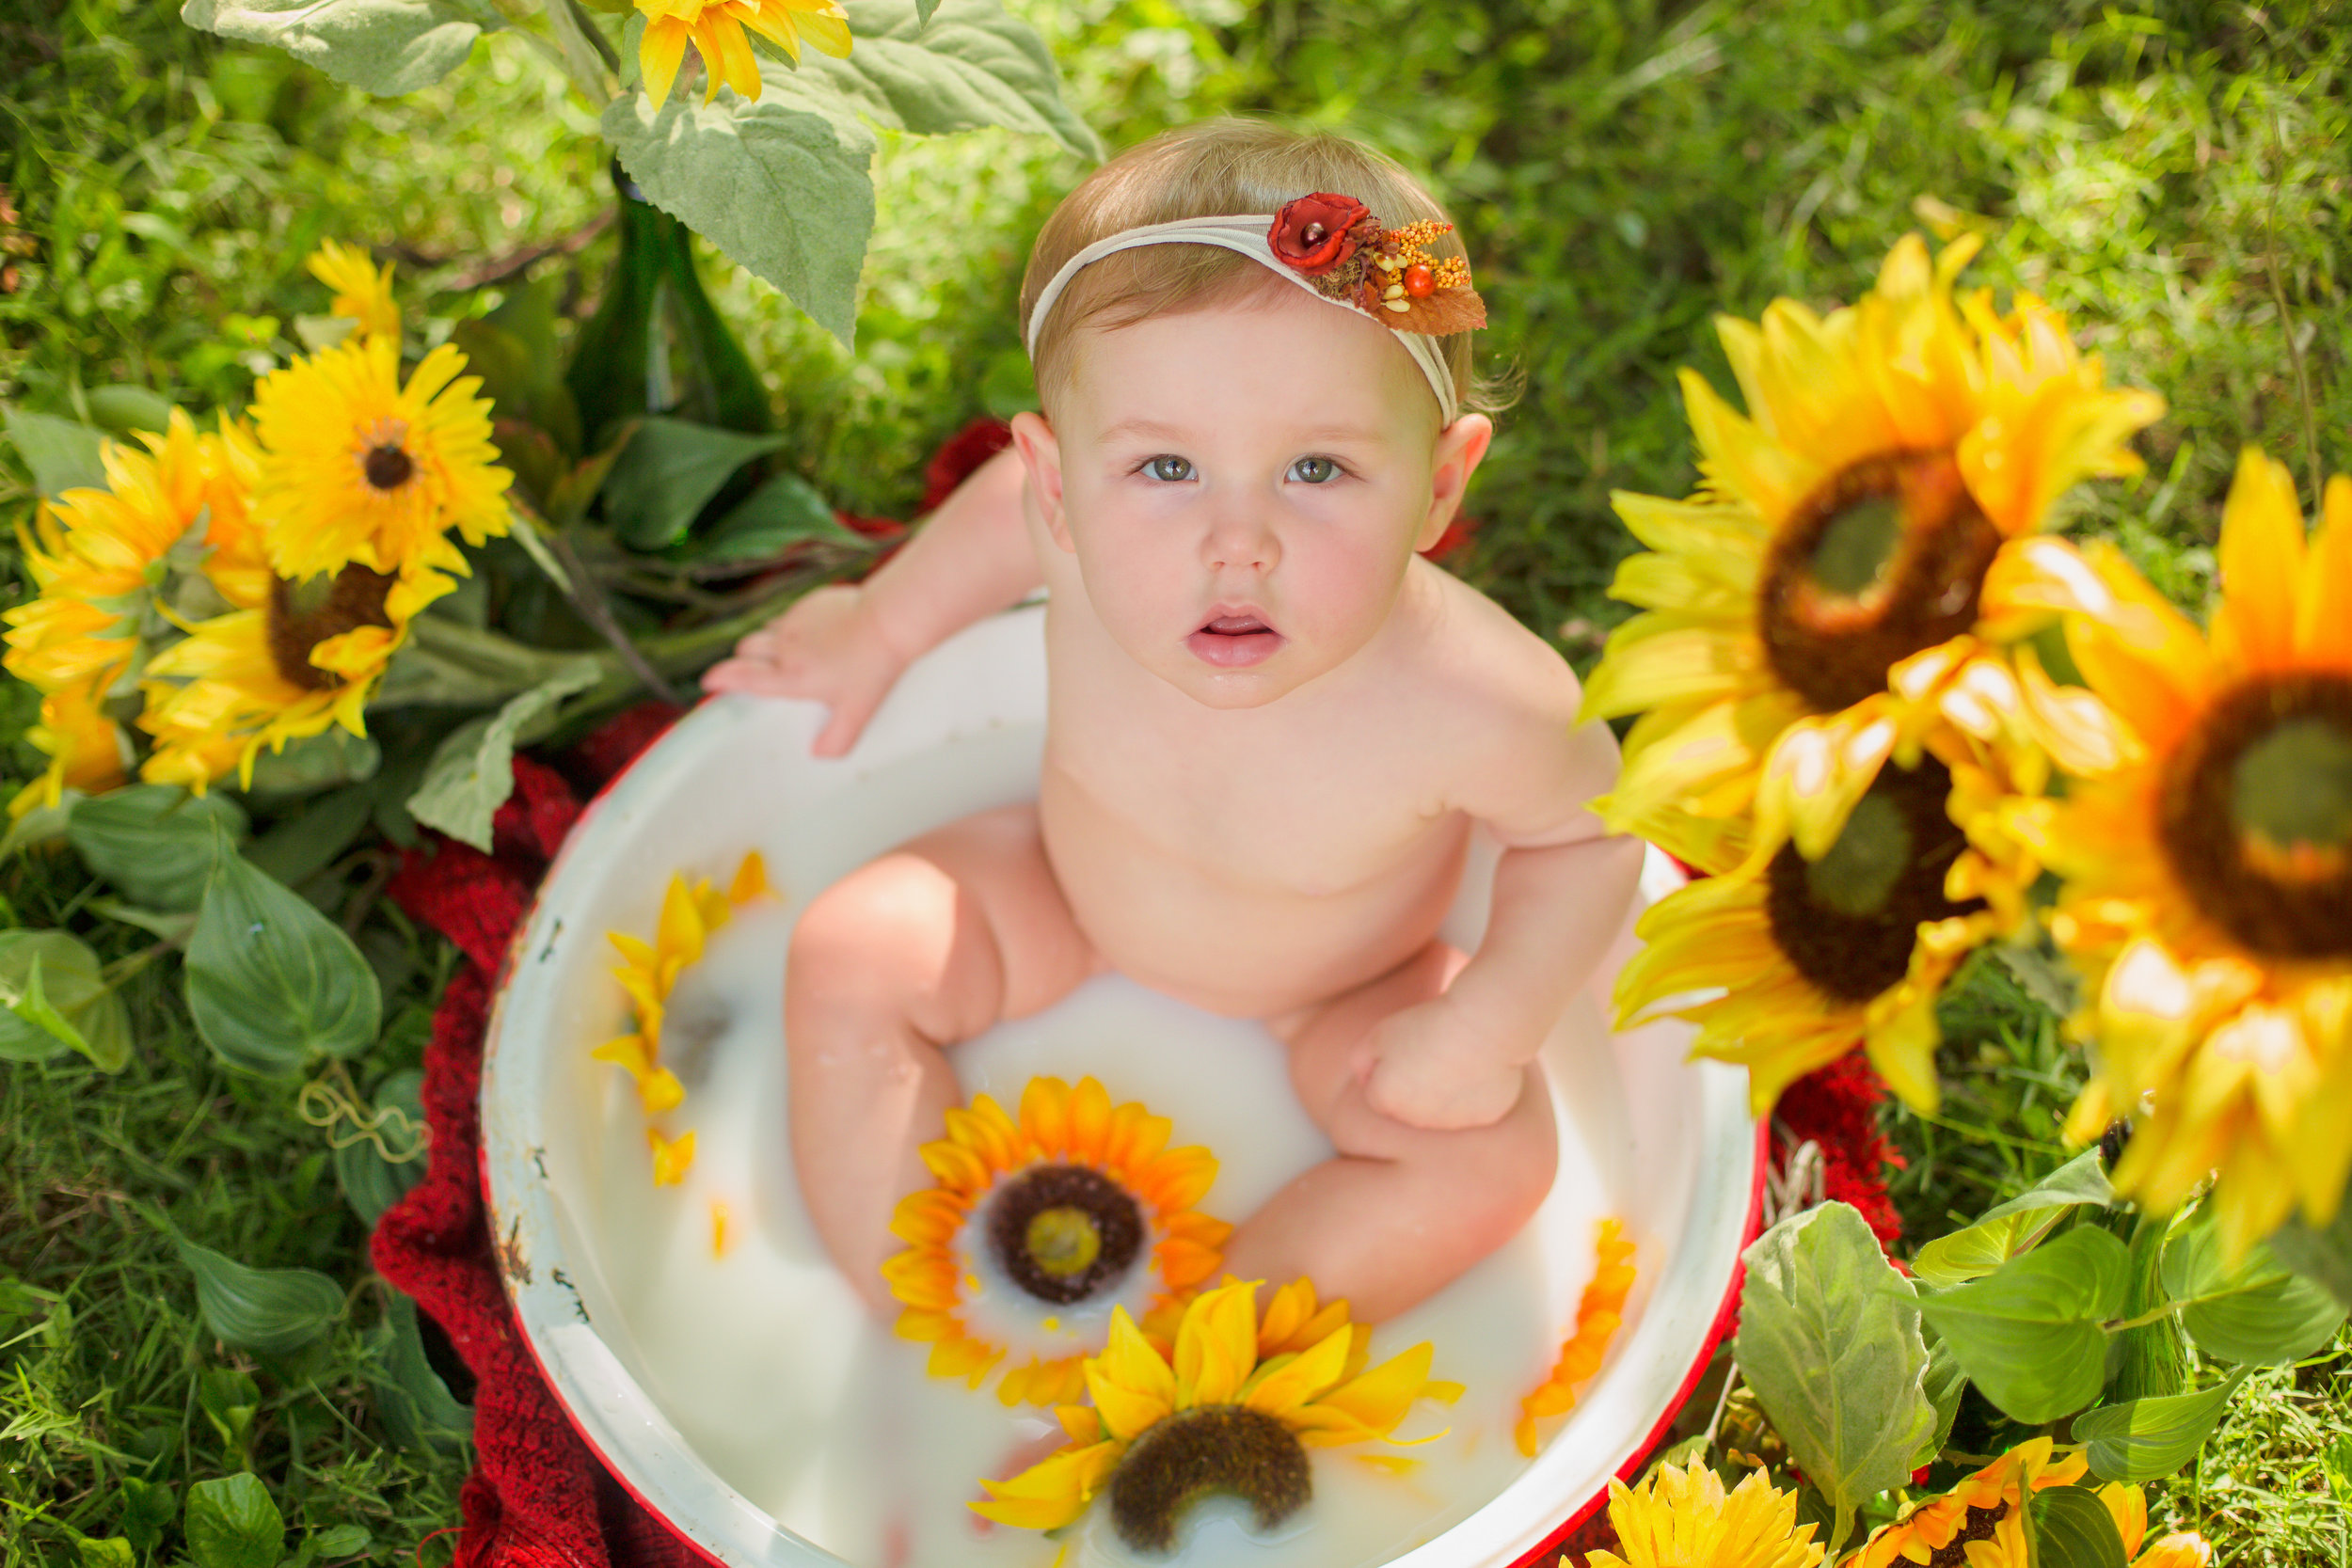 Sawyer-Jo-Sunflower-Milk-bath-Nashville-Family-Photographer-Chelsea-Meadows-Photography-(17).jpg